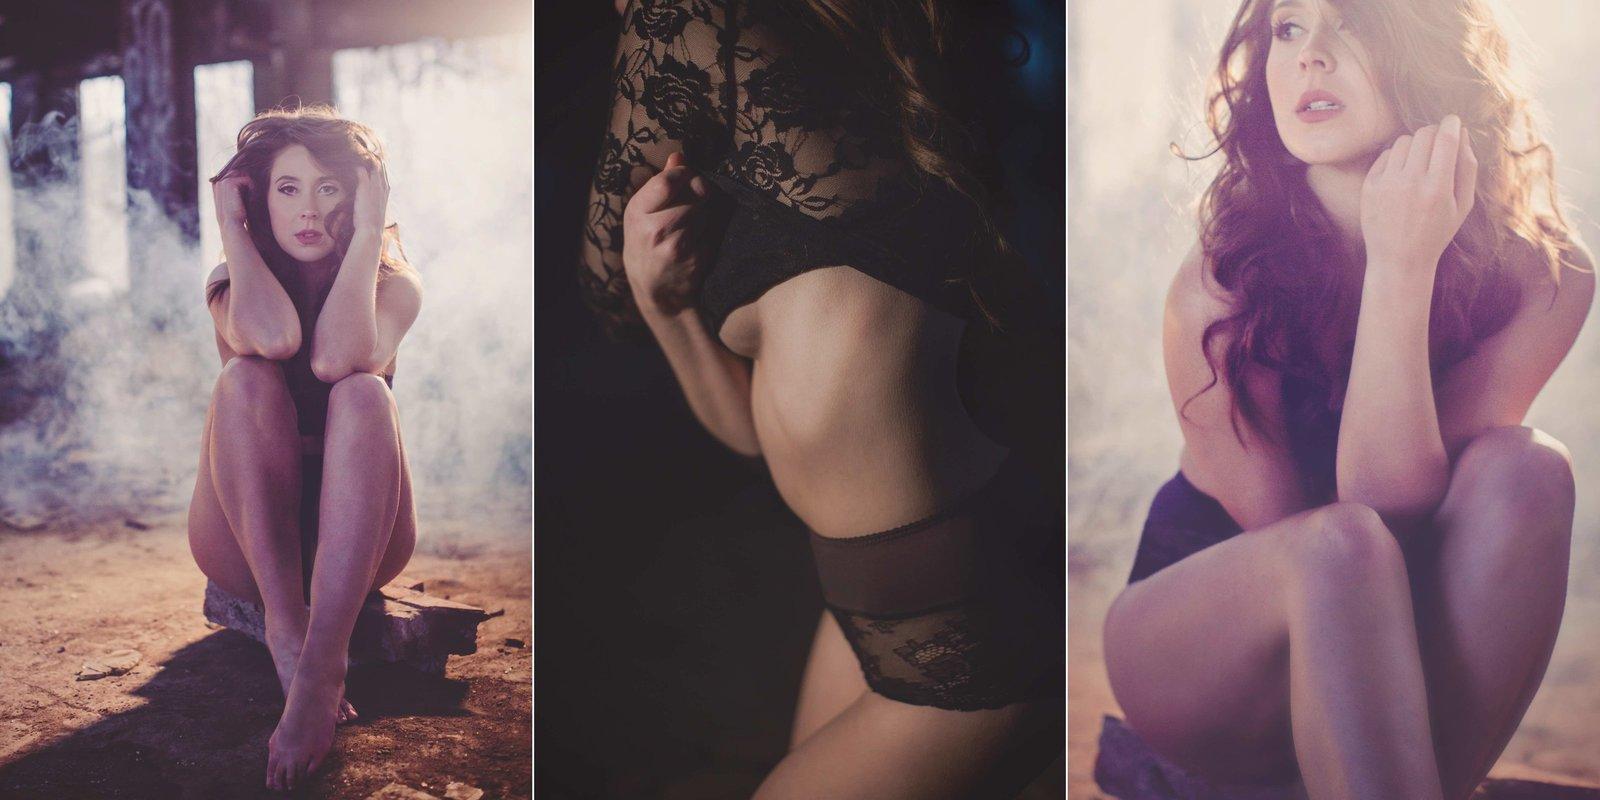 boston_saratoga_springs_boudoir_intimate_studio_photographer009